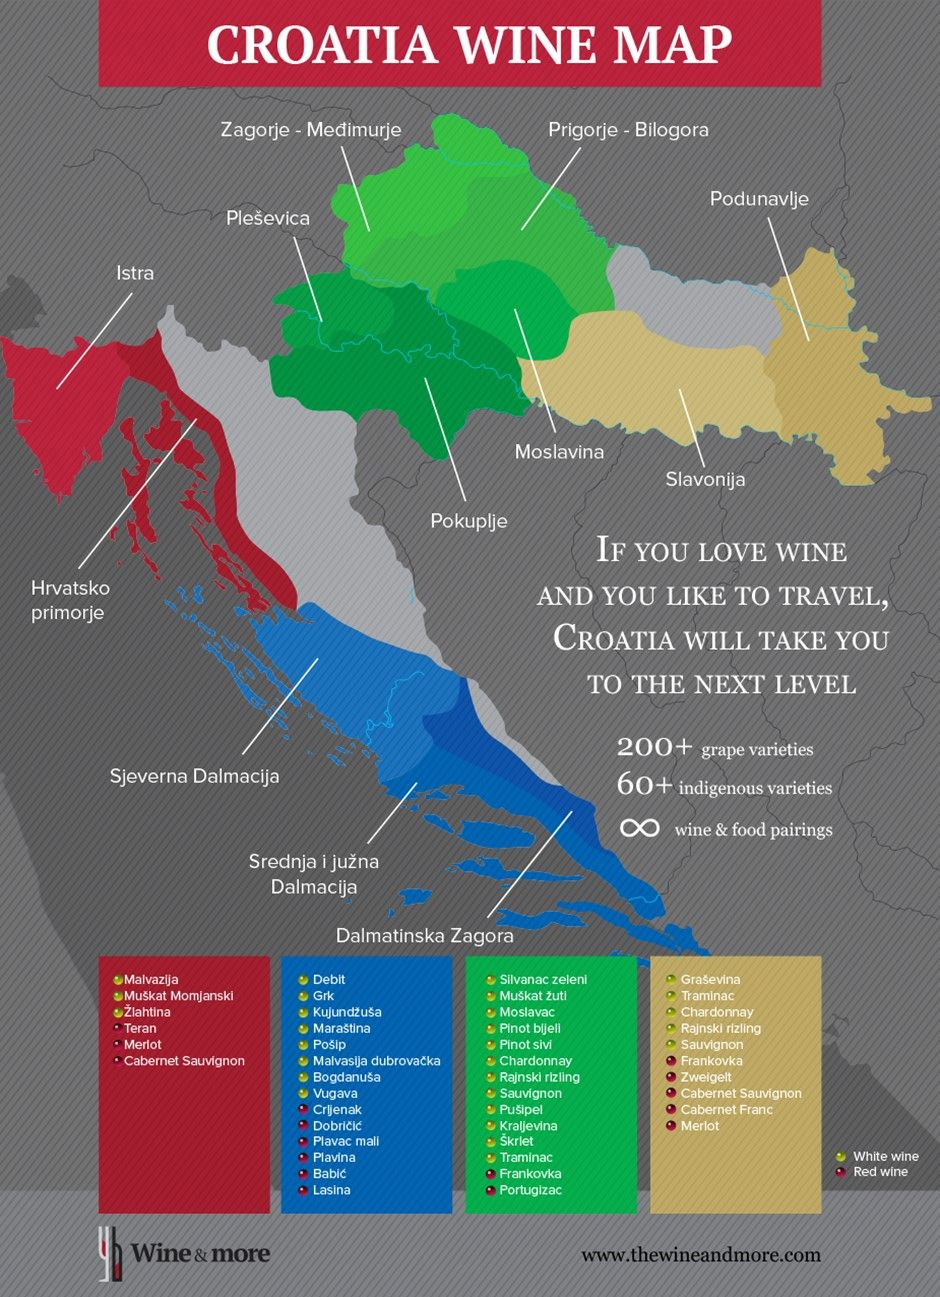 Infographic Croatian Wine Map Wine Regions Of Croatia Weingeist Wein Landkarte